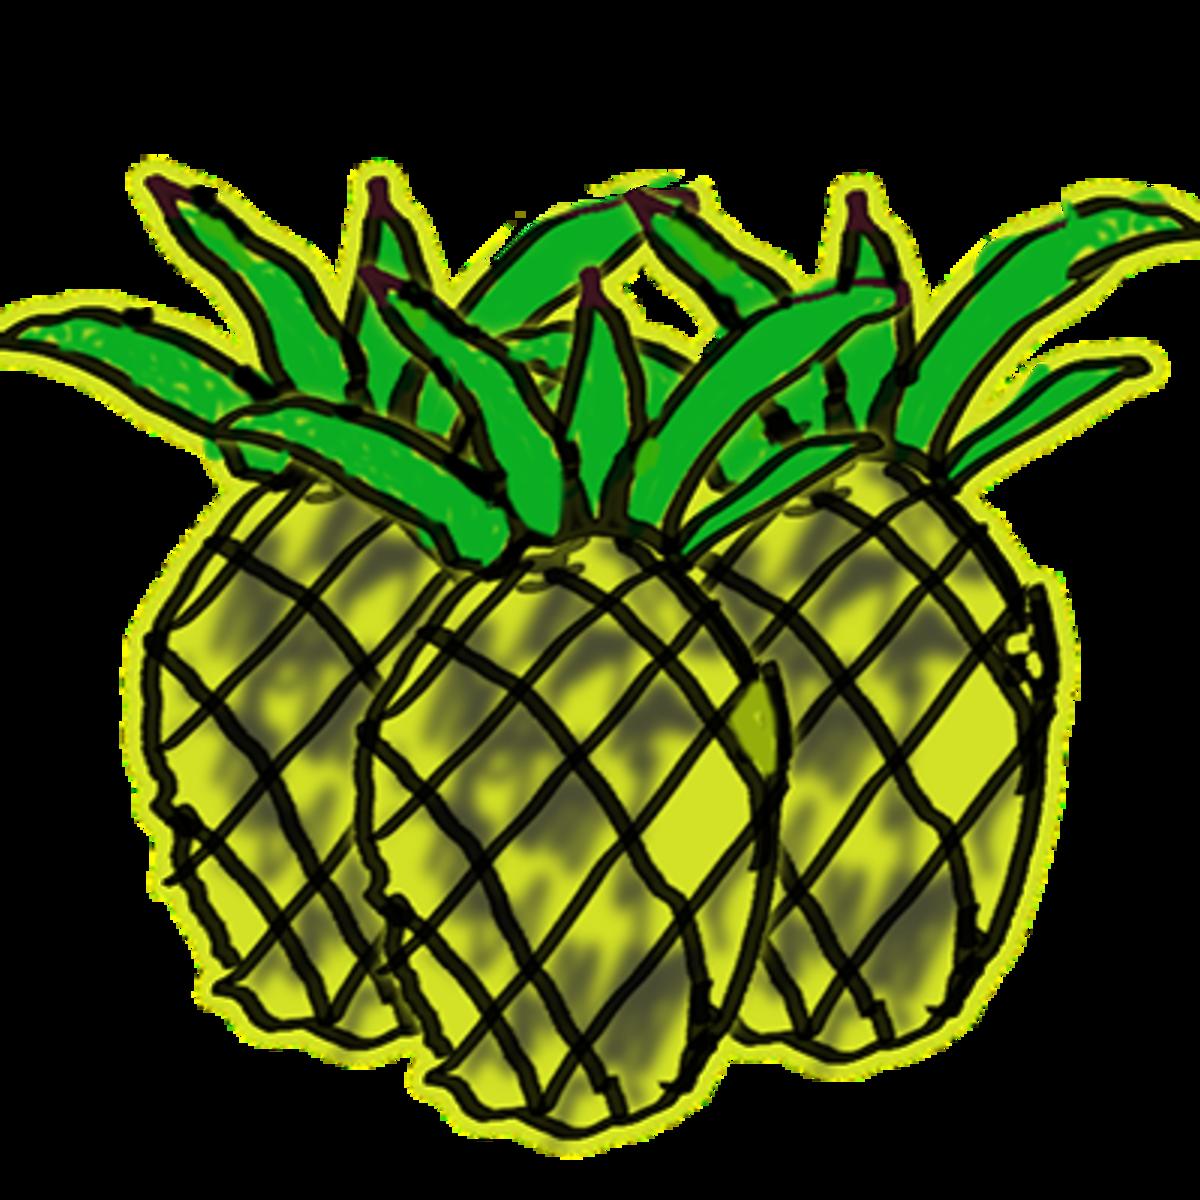 mod pineapple art